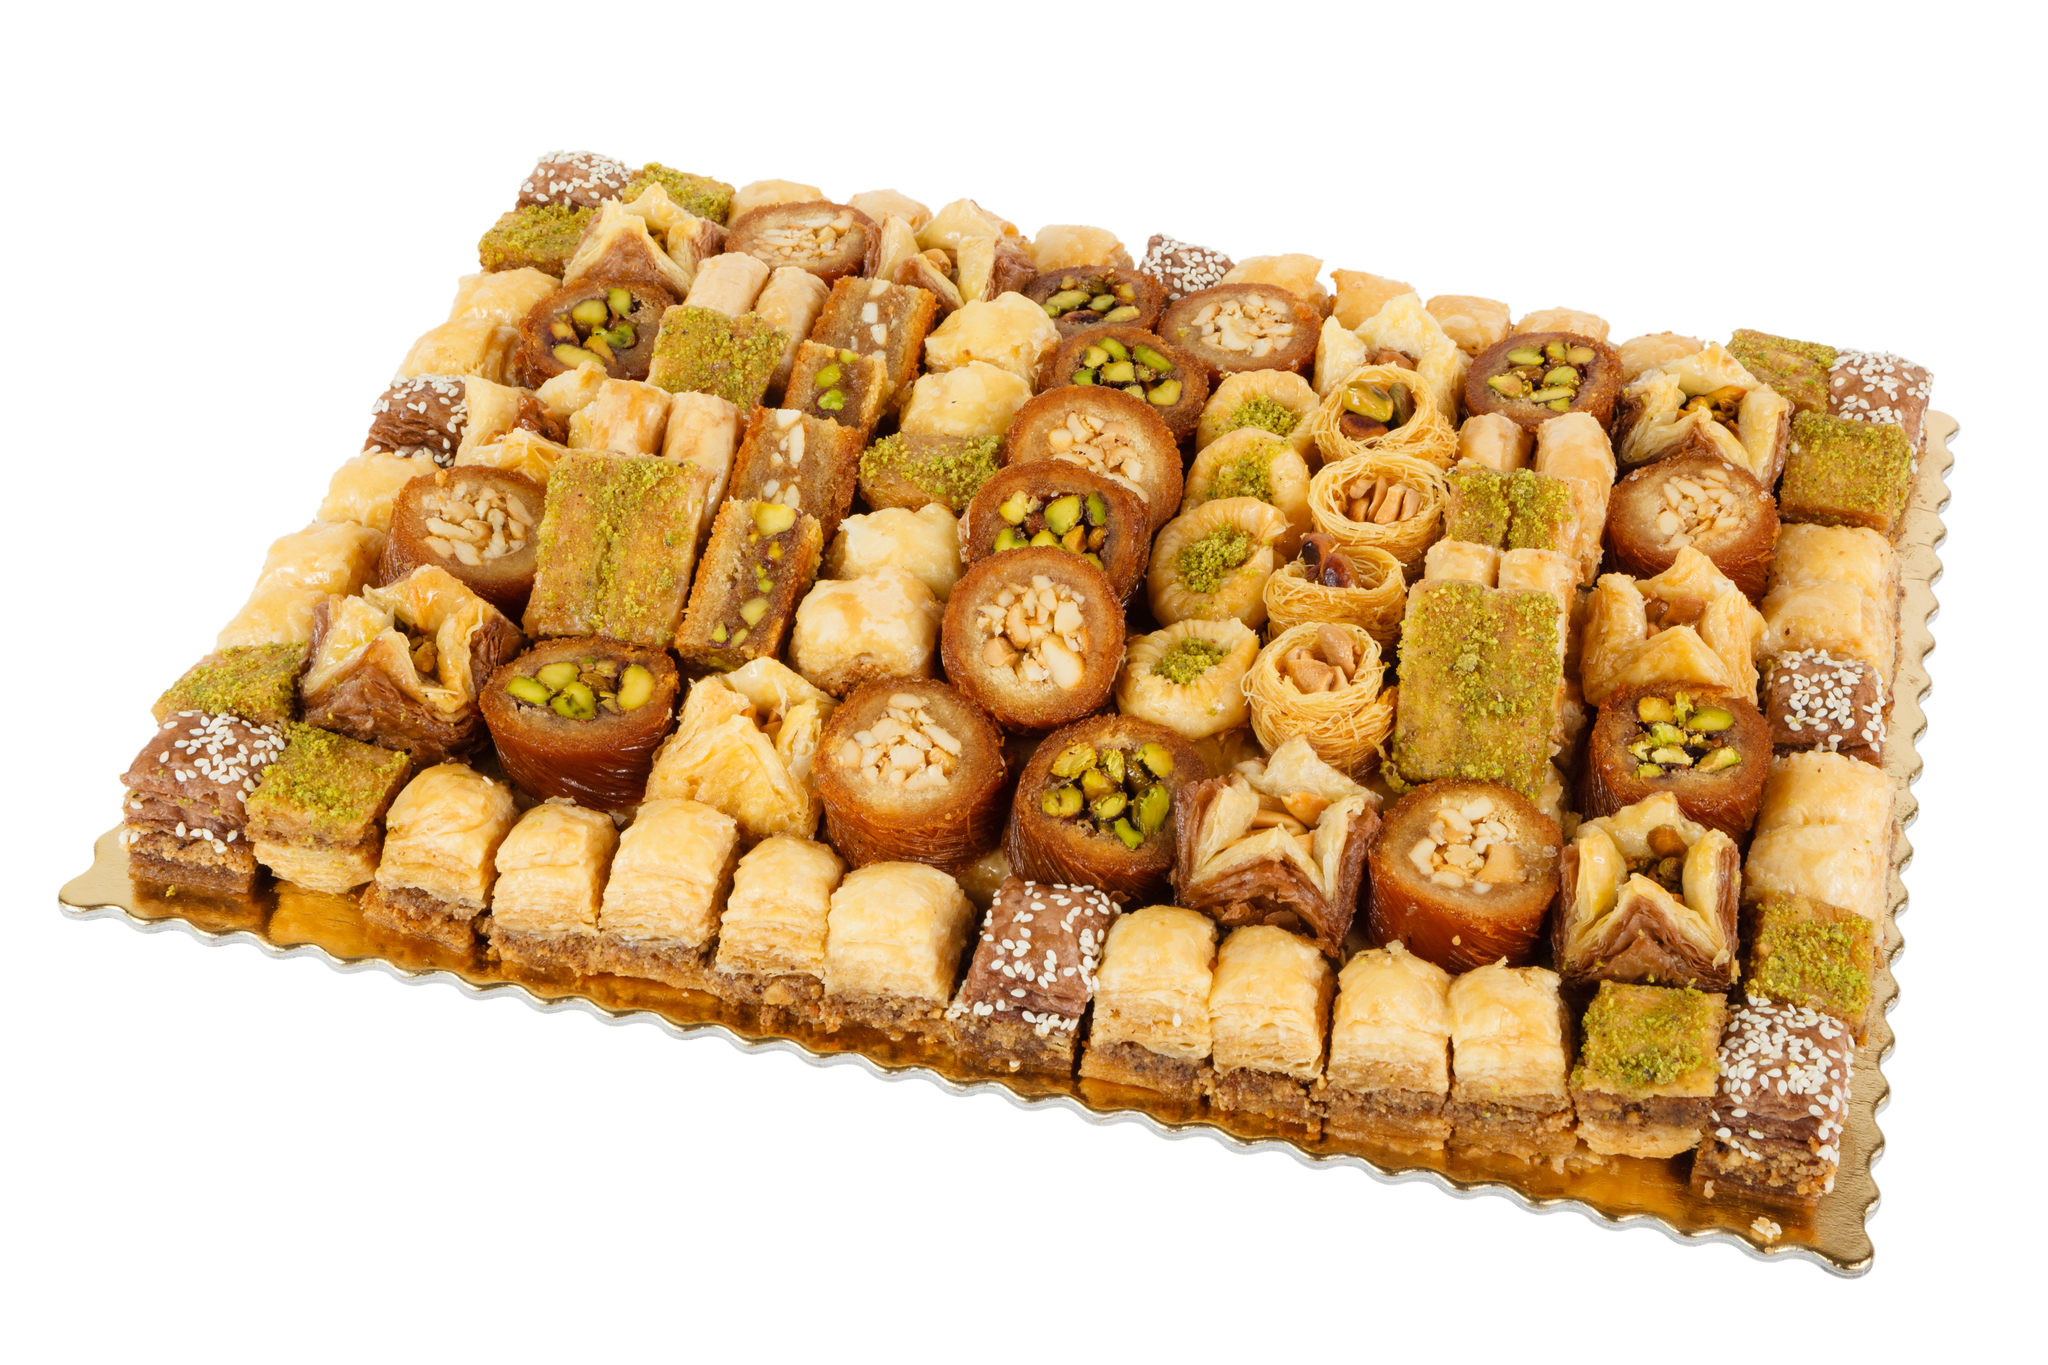 "Ассорти Пахлава - ассорти ливанских сладостей ""Королевское"", 3000 г import_files_7e_7e6d0b6a787e11e799f3606c664b1de1_226777edae6c11e7b011fcaa1488e48f.jpg"